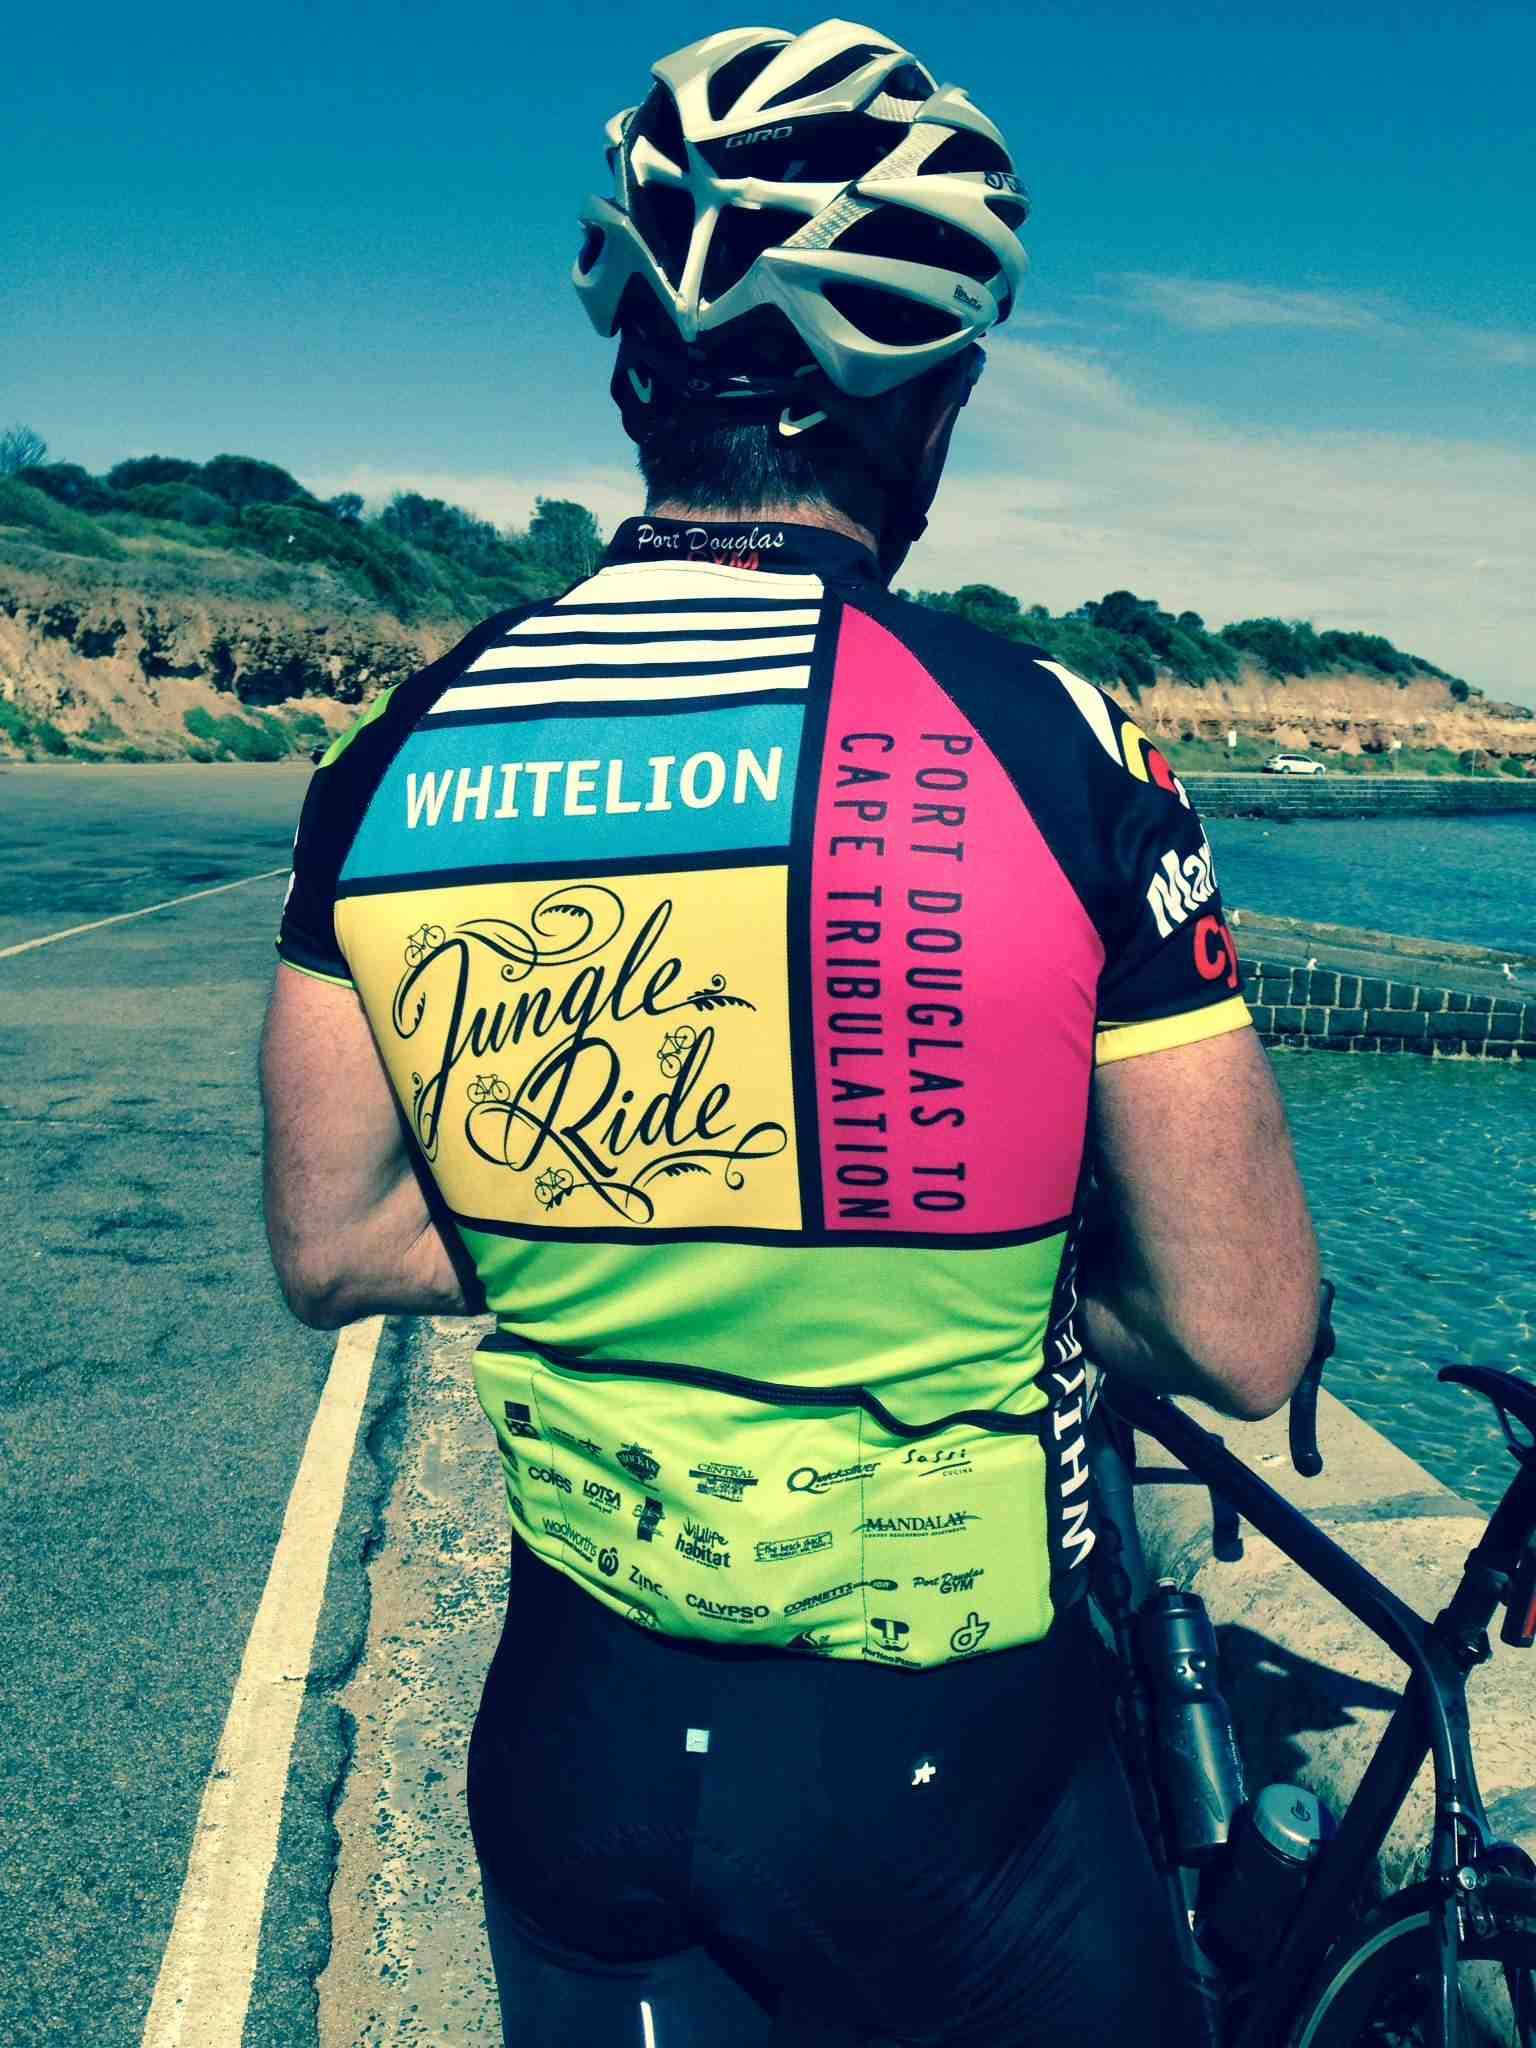 Whitelion Jungle Ride